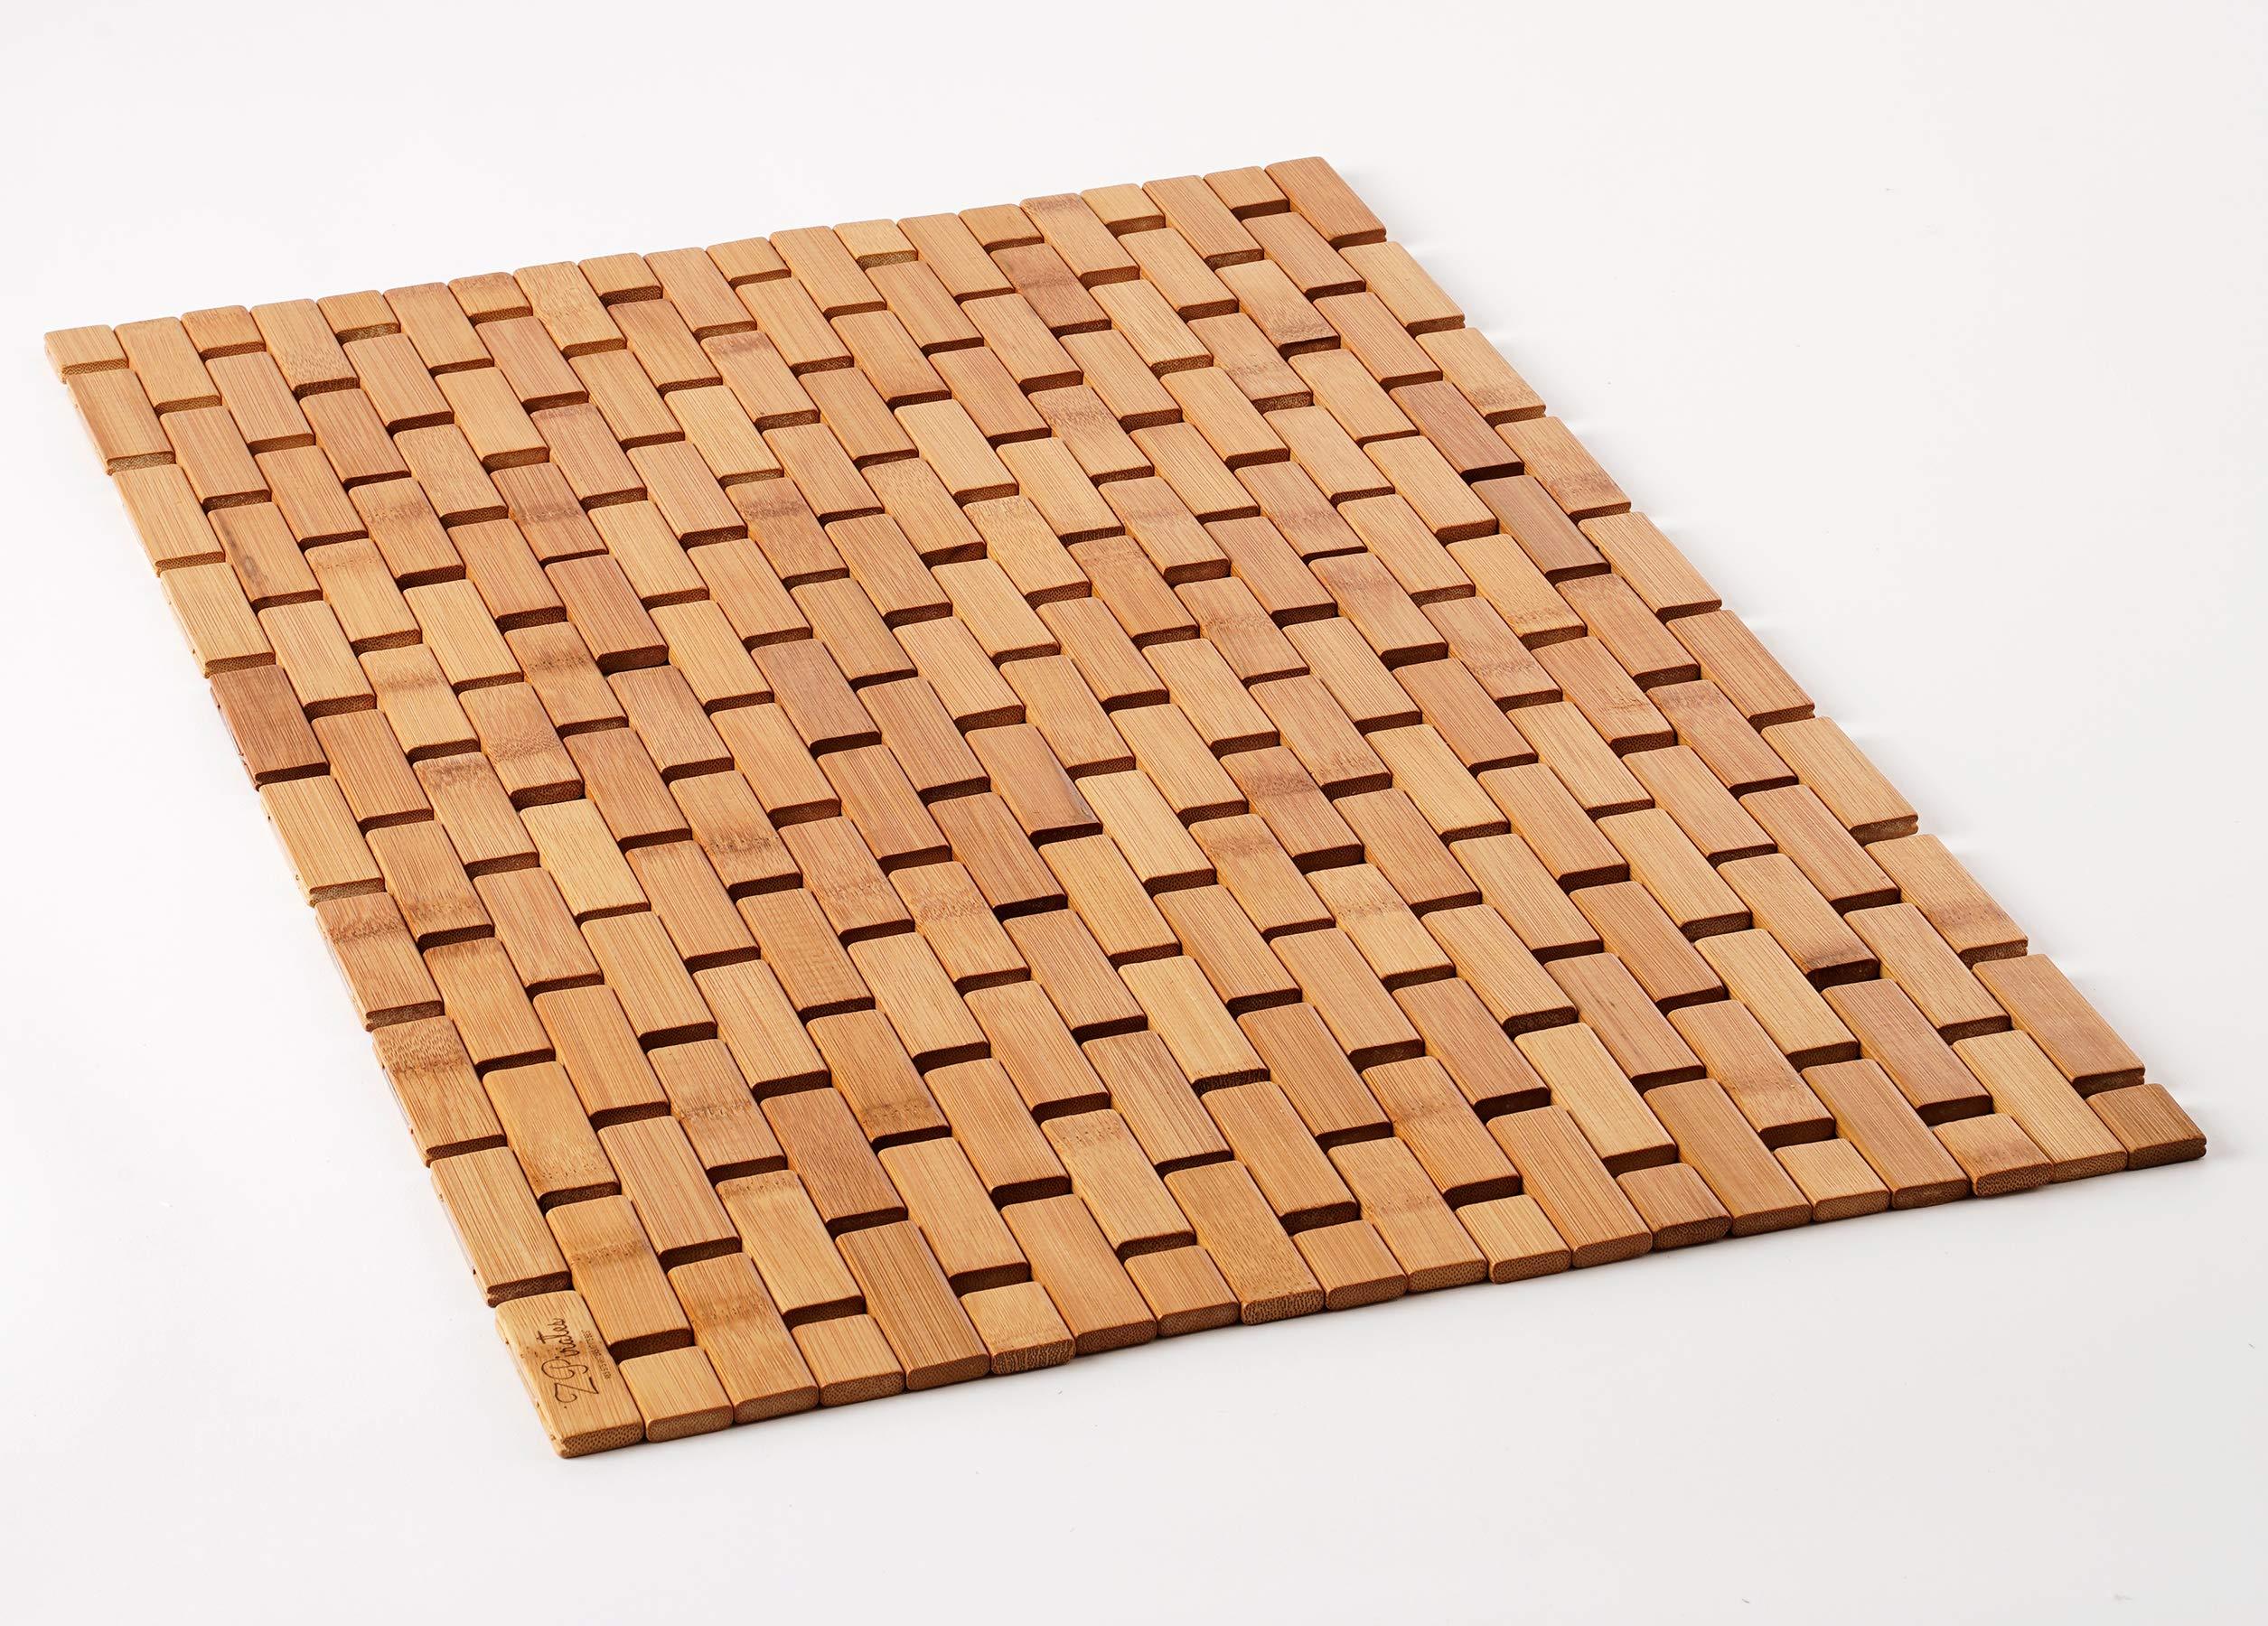 Natural Bamboo Wood Bath Mat, Door Mat and Kitchen Rug - Boho Accessories for Bathroom, Sauna, Tub, Shower Doorsteps and Textured Floors (Bamboo Lattice, Standard 16x24 Inch)